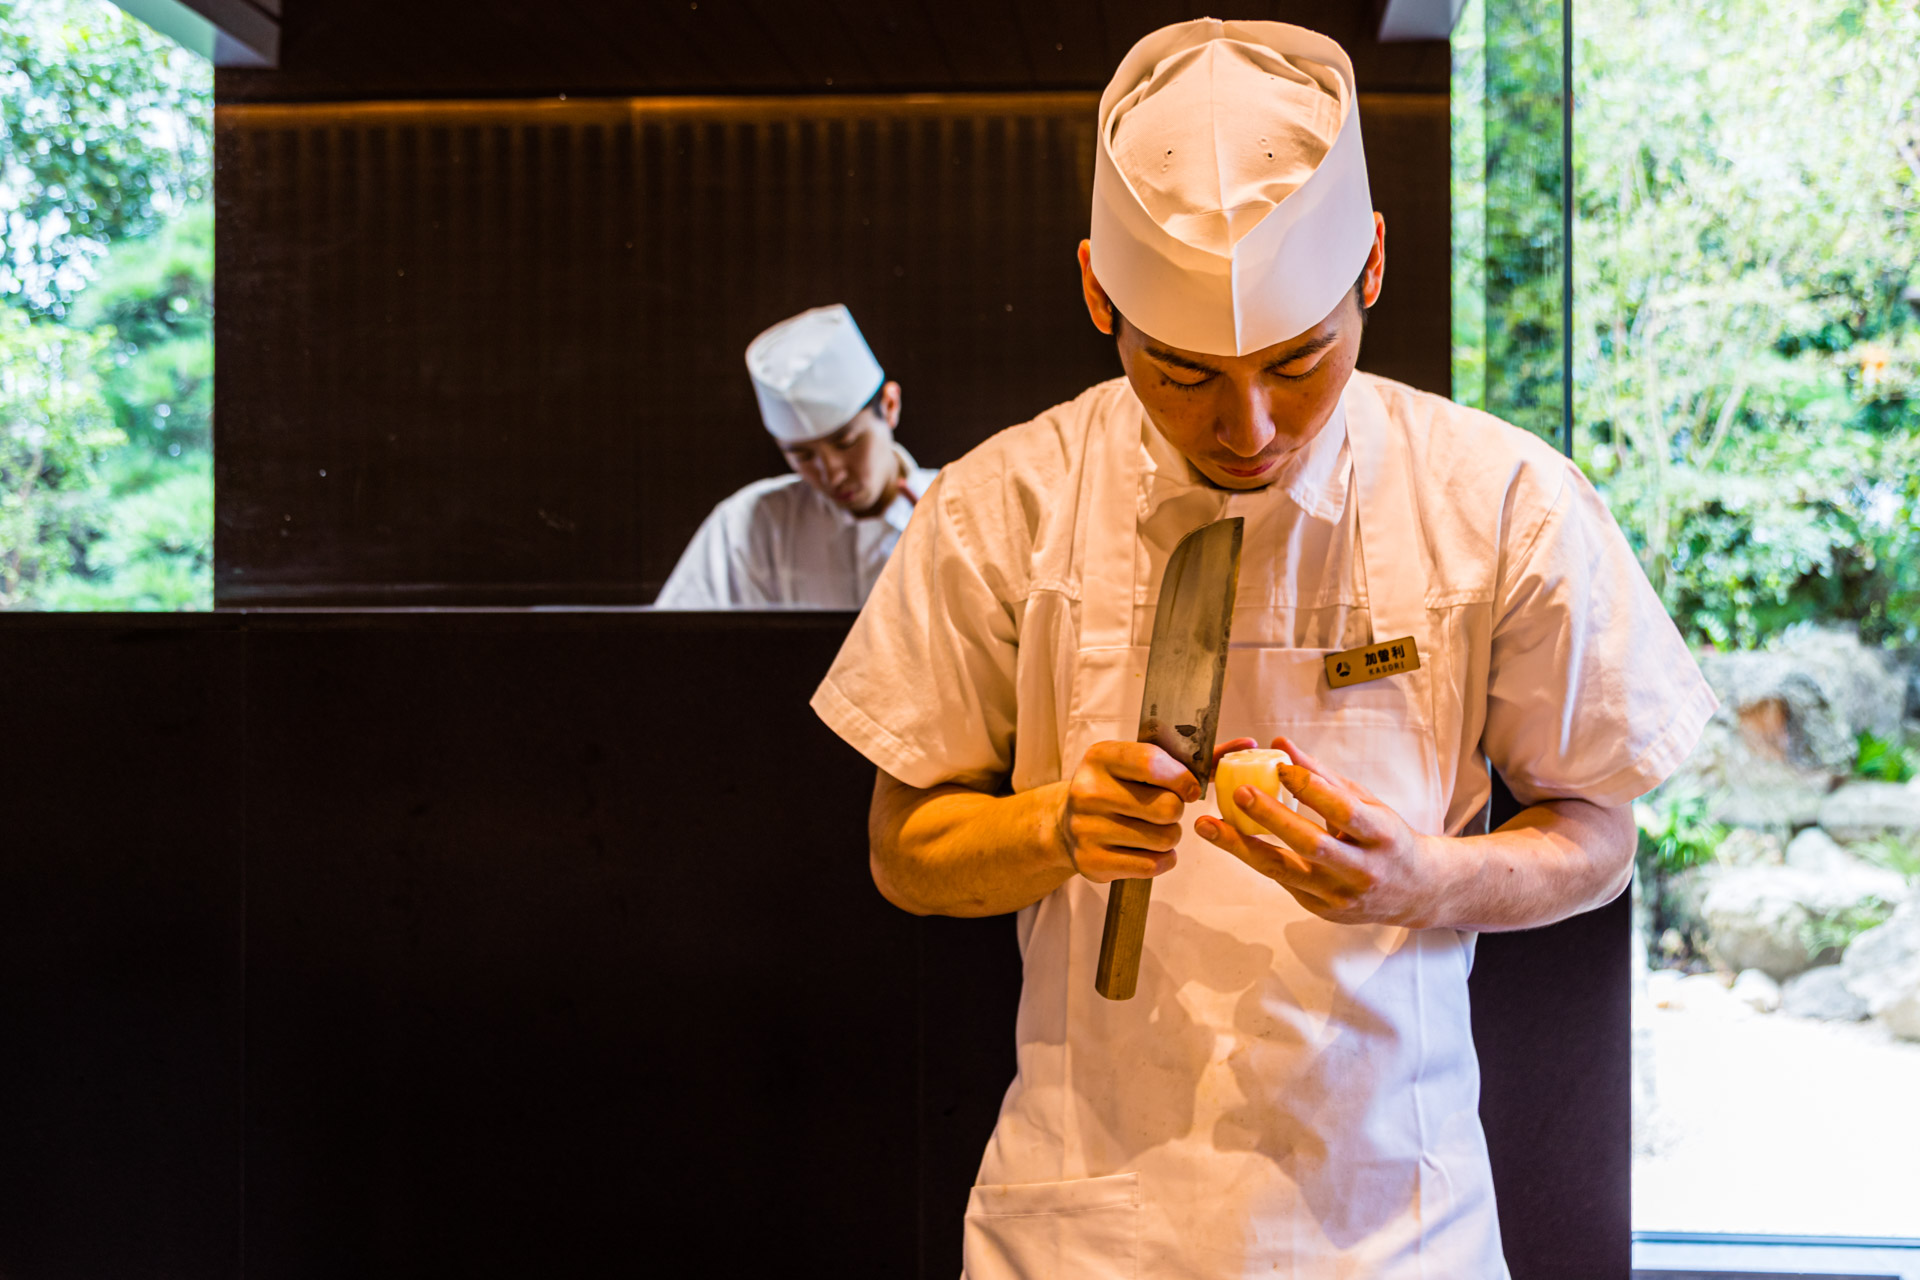 Chefs at the Okura Hotel in Tokyo preparing, Minato, Japan